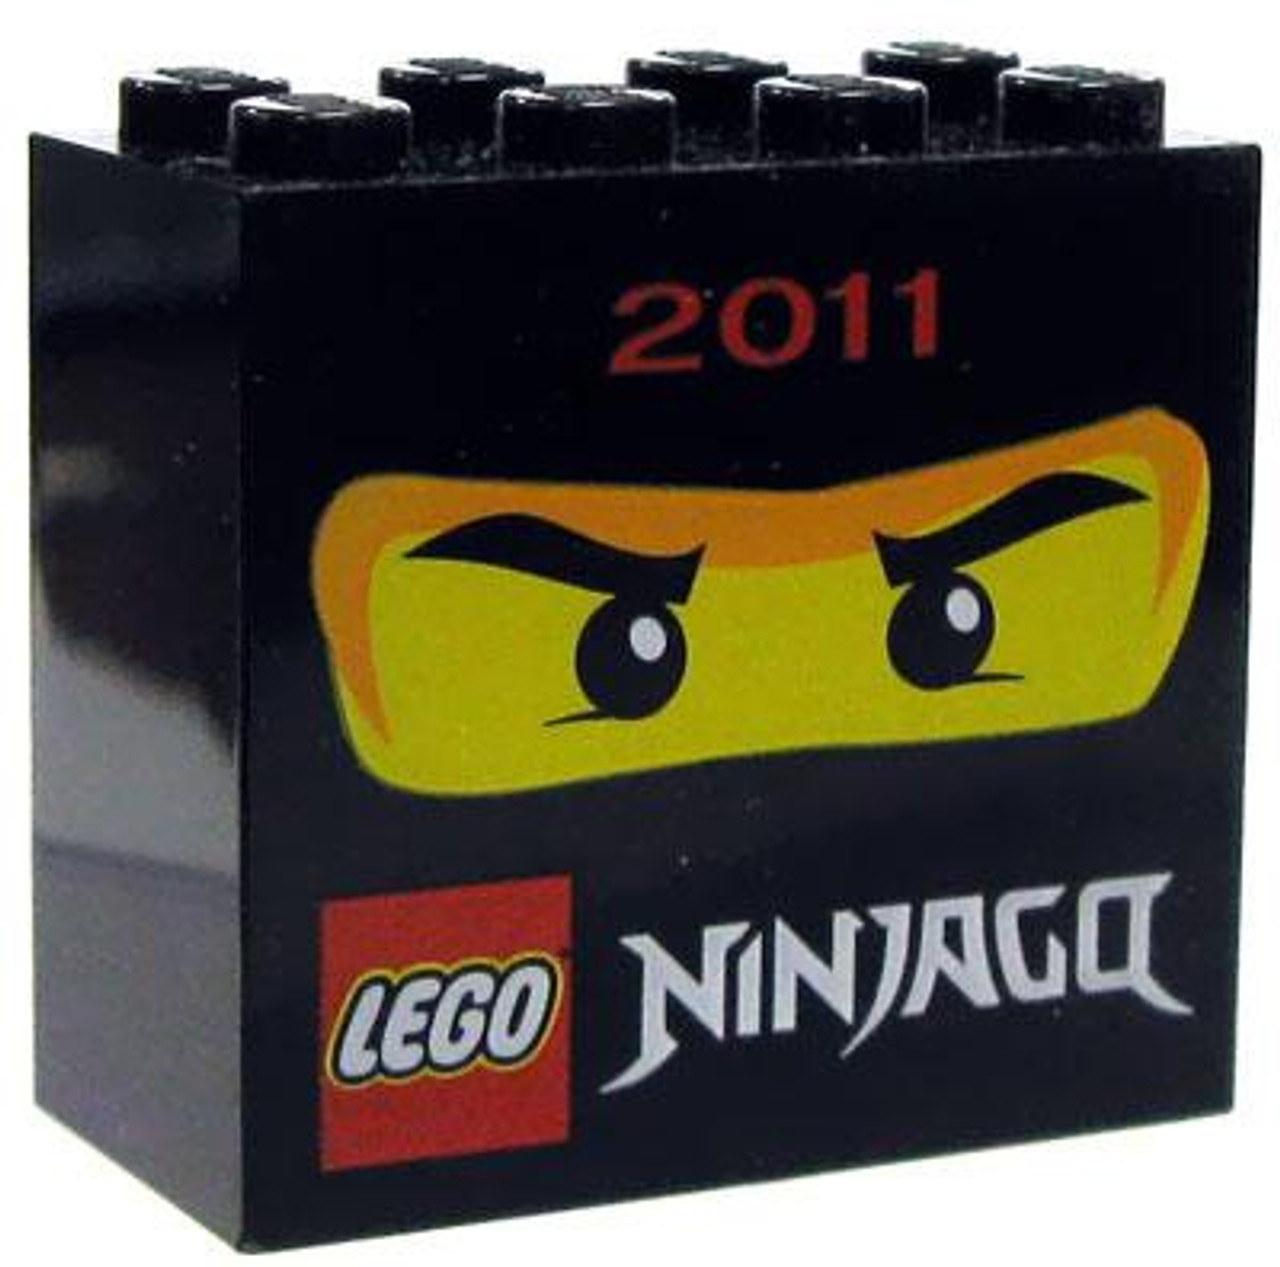 LEGO Ninjago Factory Black Brick